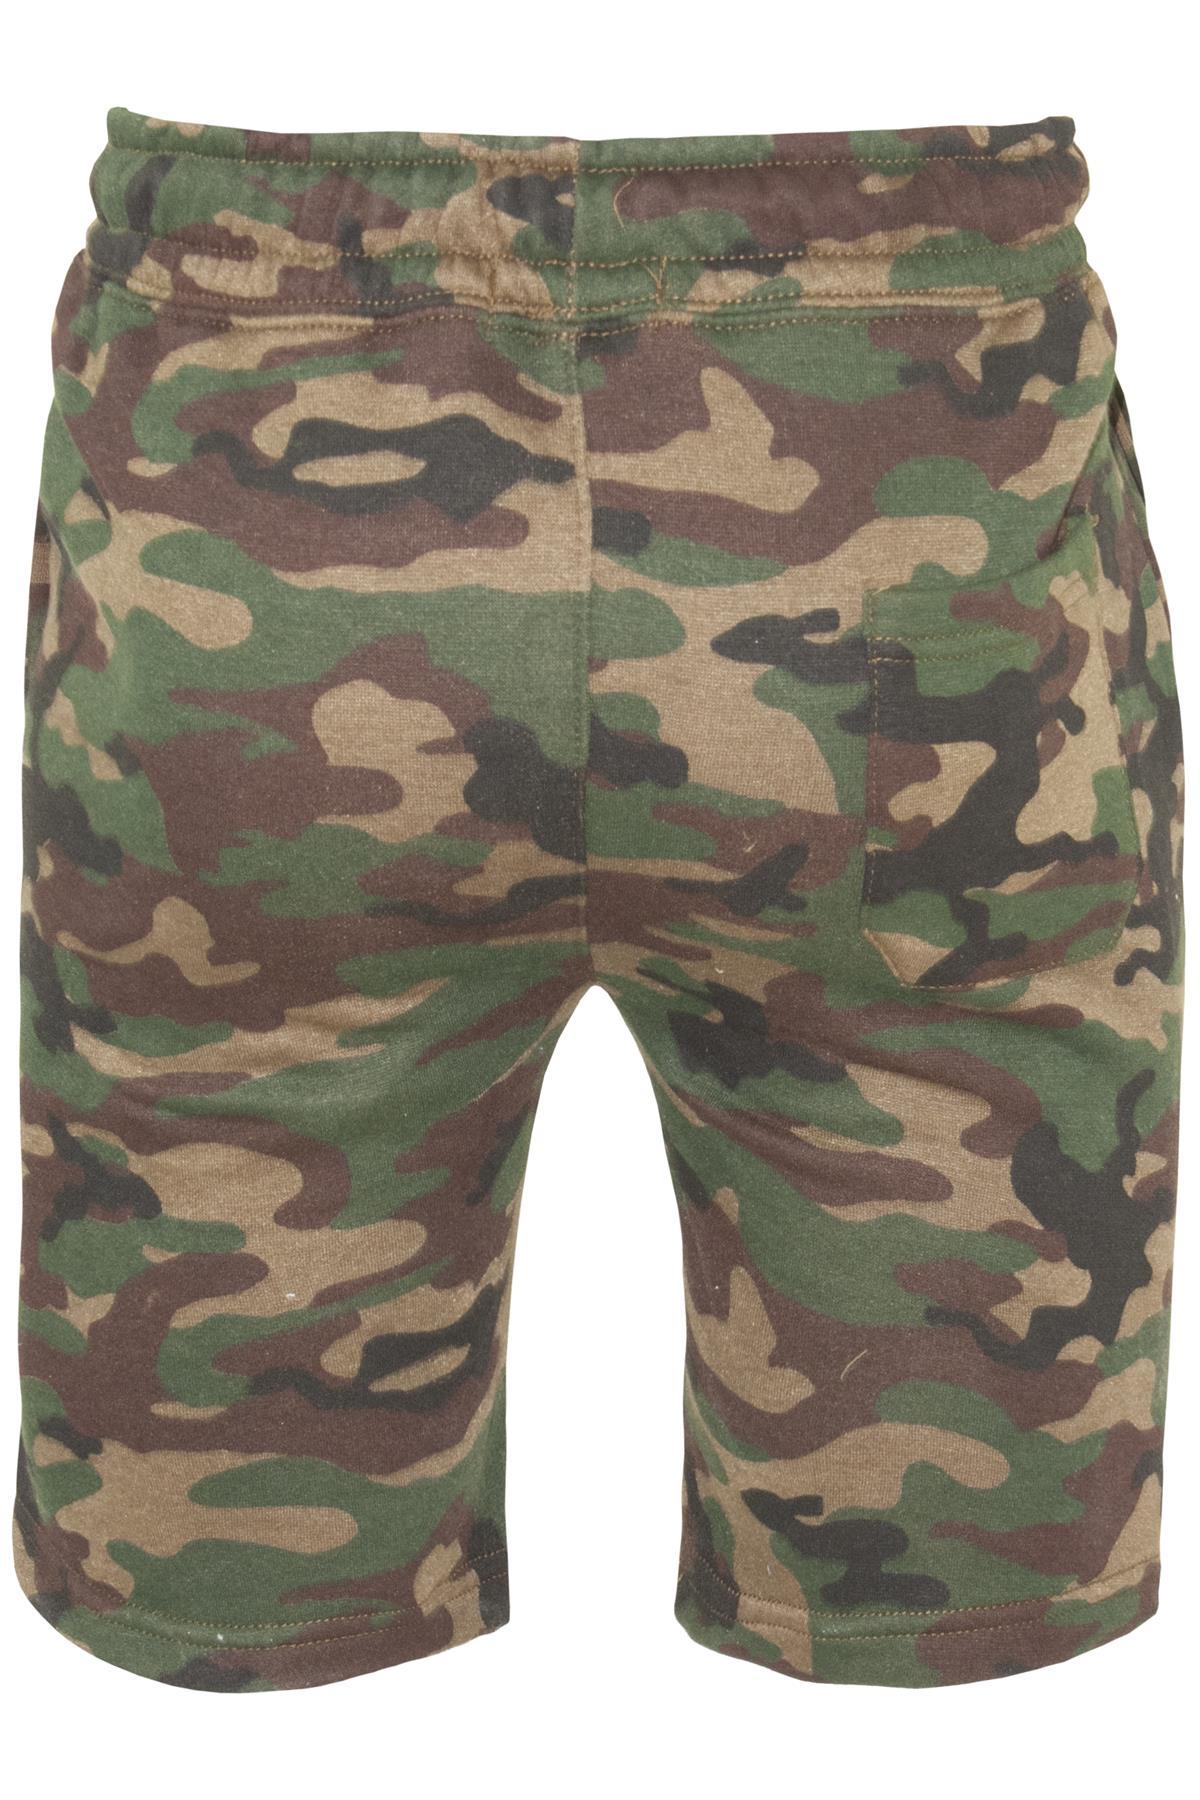 Mens-Contrast-Panel-Running-Summer-Side-Slit-Knee-Length-Fleece-Bottoms-Shorts thumbnail 54